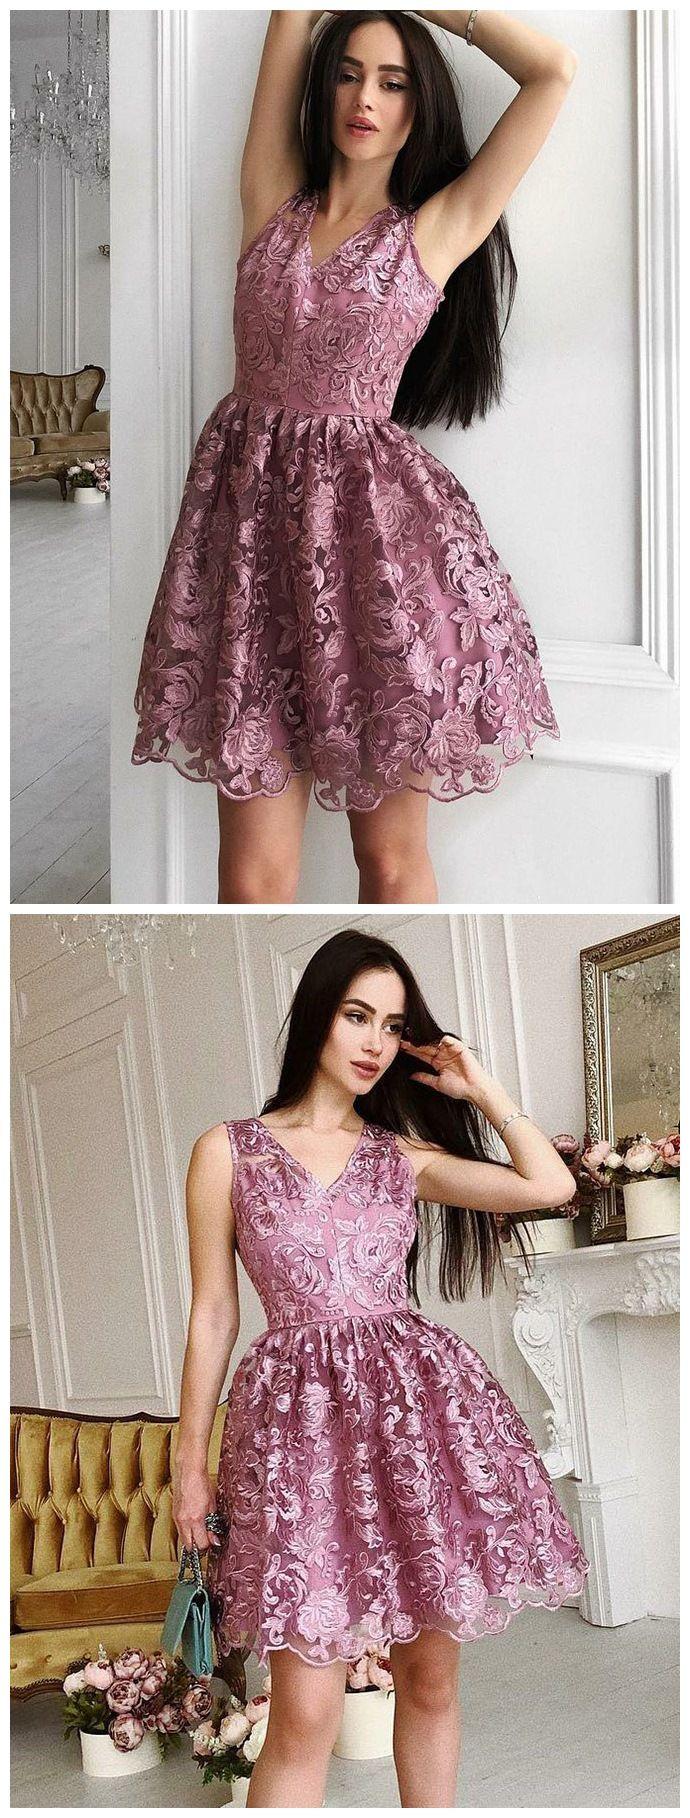 Vintage flower lace homecoming dresses v neck retro short prom dress